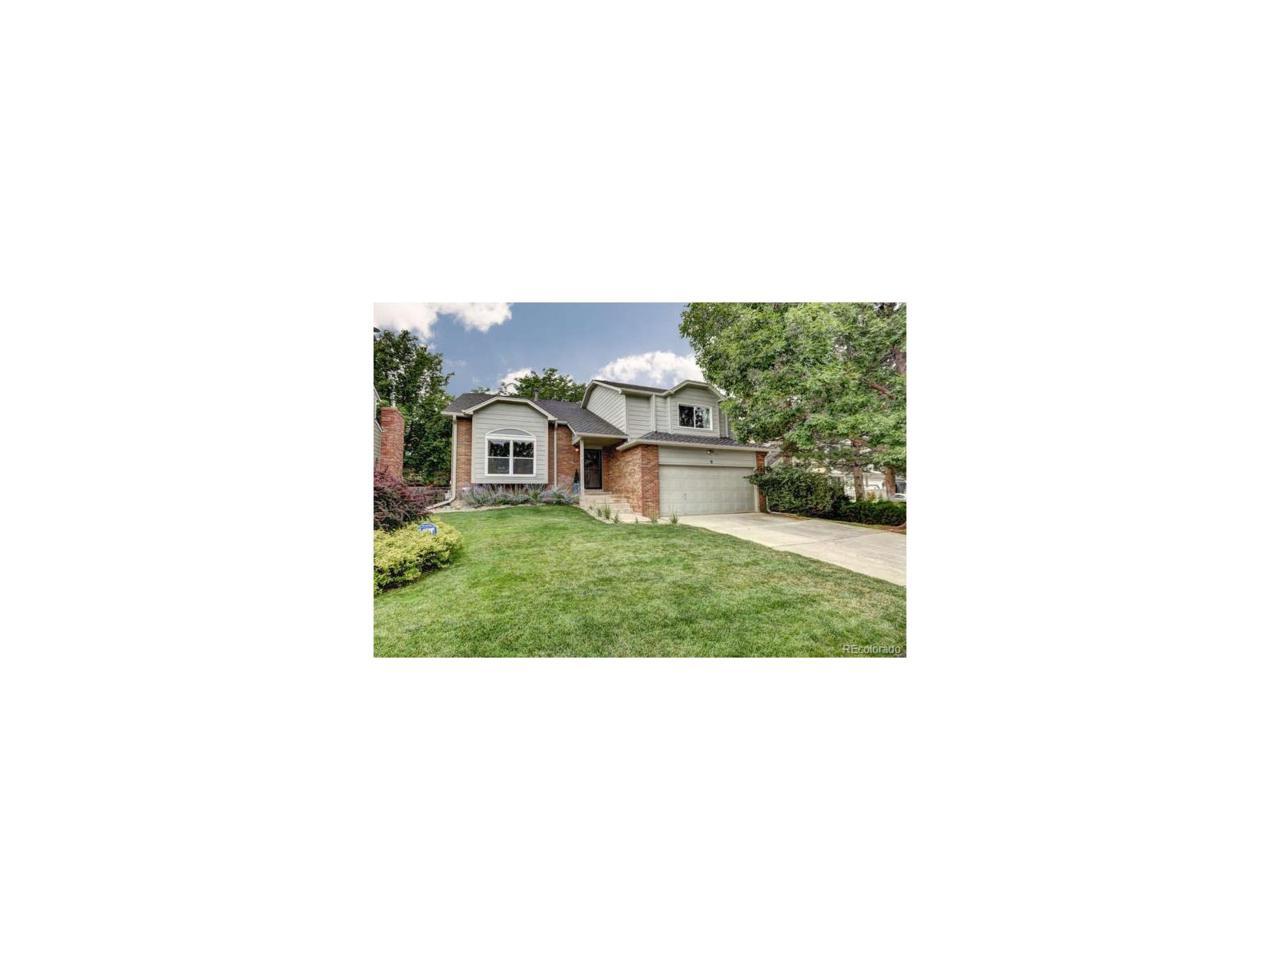 9 Canyon Alder, Littleton, CO 80127 (MLS #8568593) :: 8z Real Estate